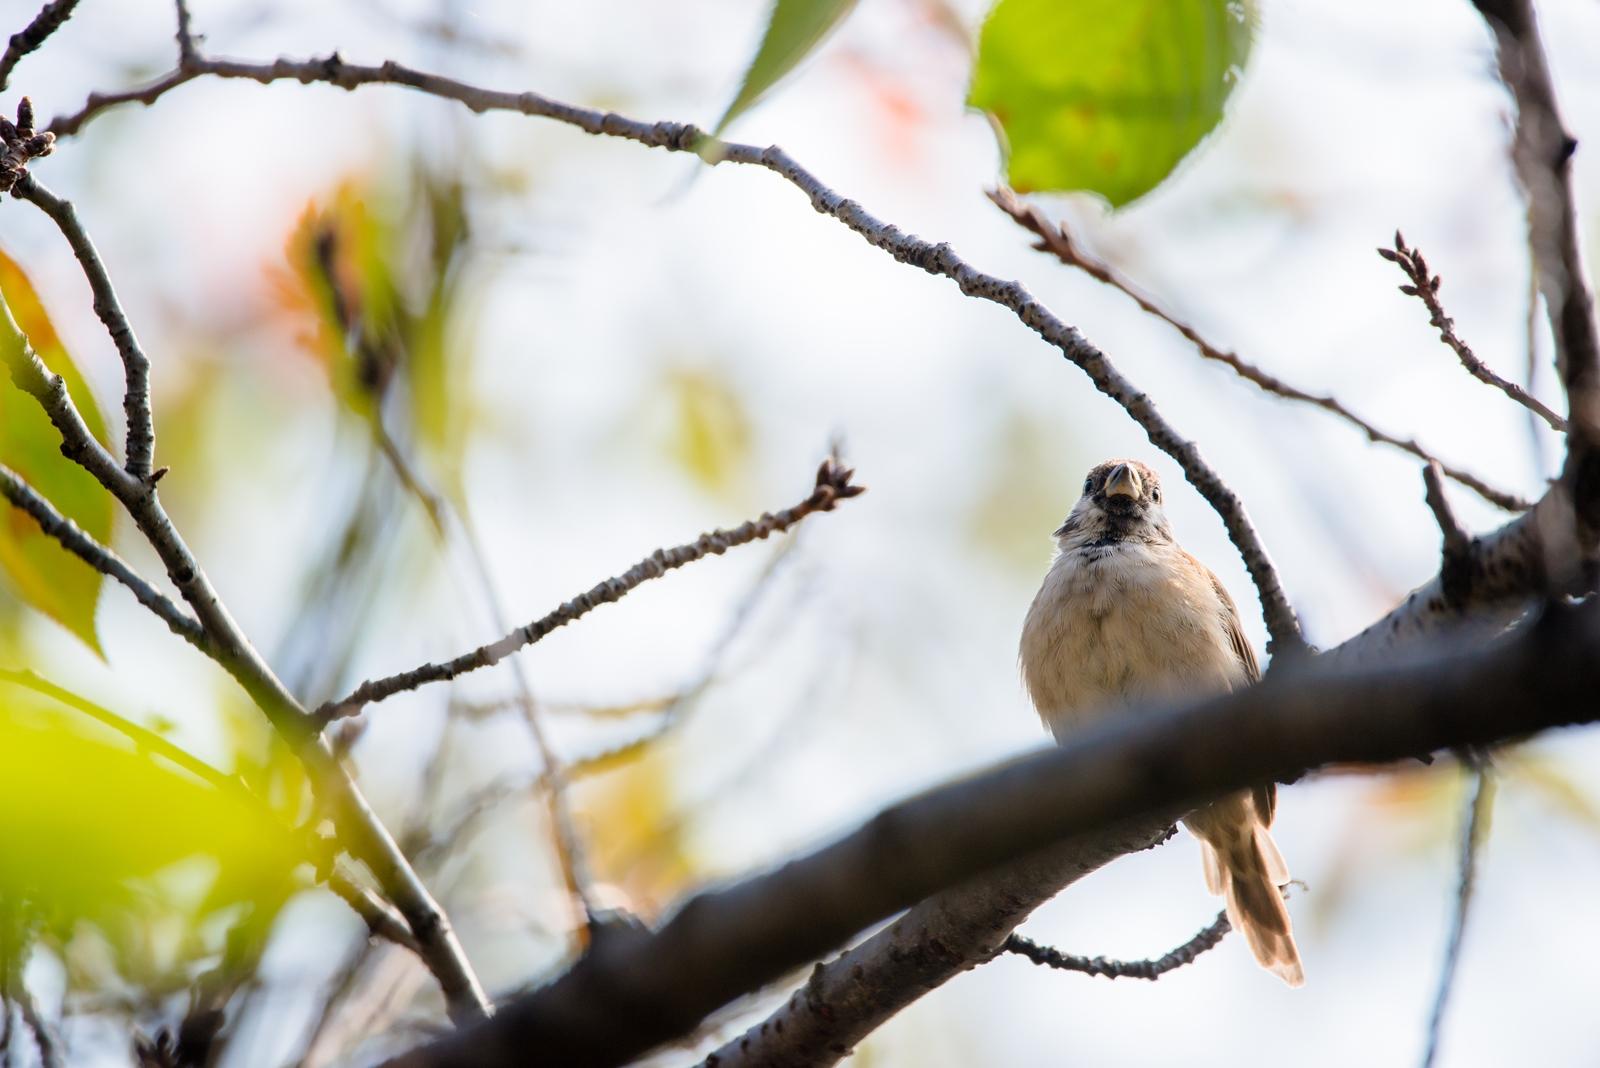 Photo: 小さな瞳に映る Autumn in the small eyes.  初めての秋 少し寂しいかな 葉が一枚また一枚 大丈夫 また戻ってくるよ  Sparrow. (雀)  #birdphotography #birds #cooljapan #kawaii #nikon #sigma #sparrow  Nikon D800E SIGMA 150-600mm F5-6.3 DG OS HSM Contemporary  大塩貴文 写真展『まなざし』 2015年11月20日[金]-29日[日] < http://islandgallery.jp/12134 >